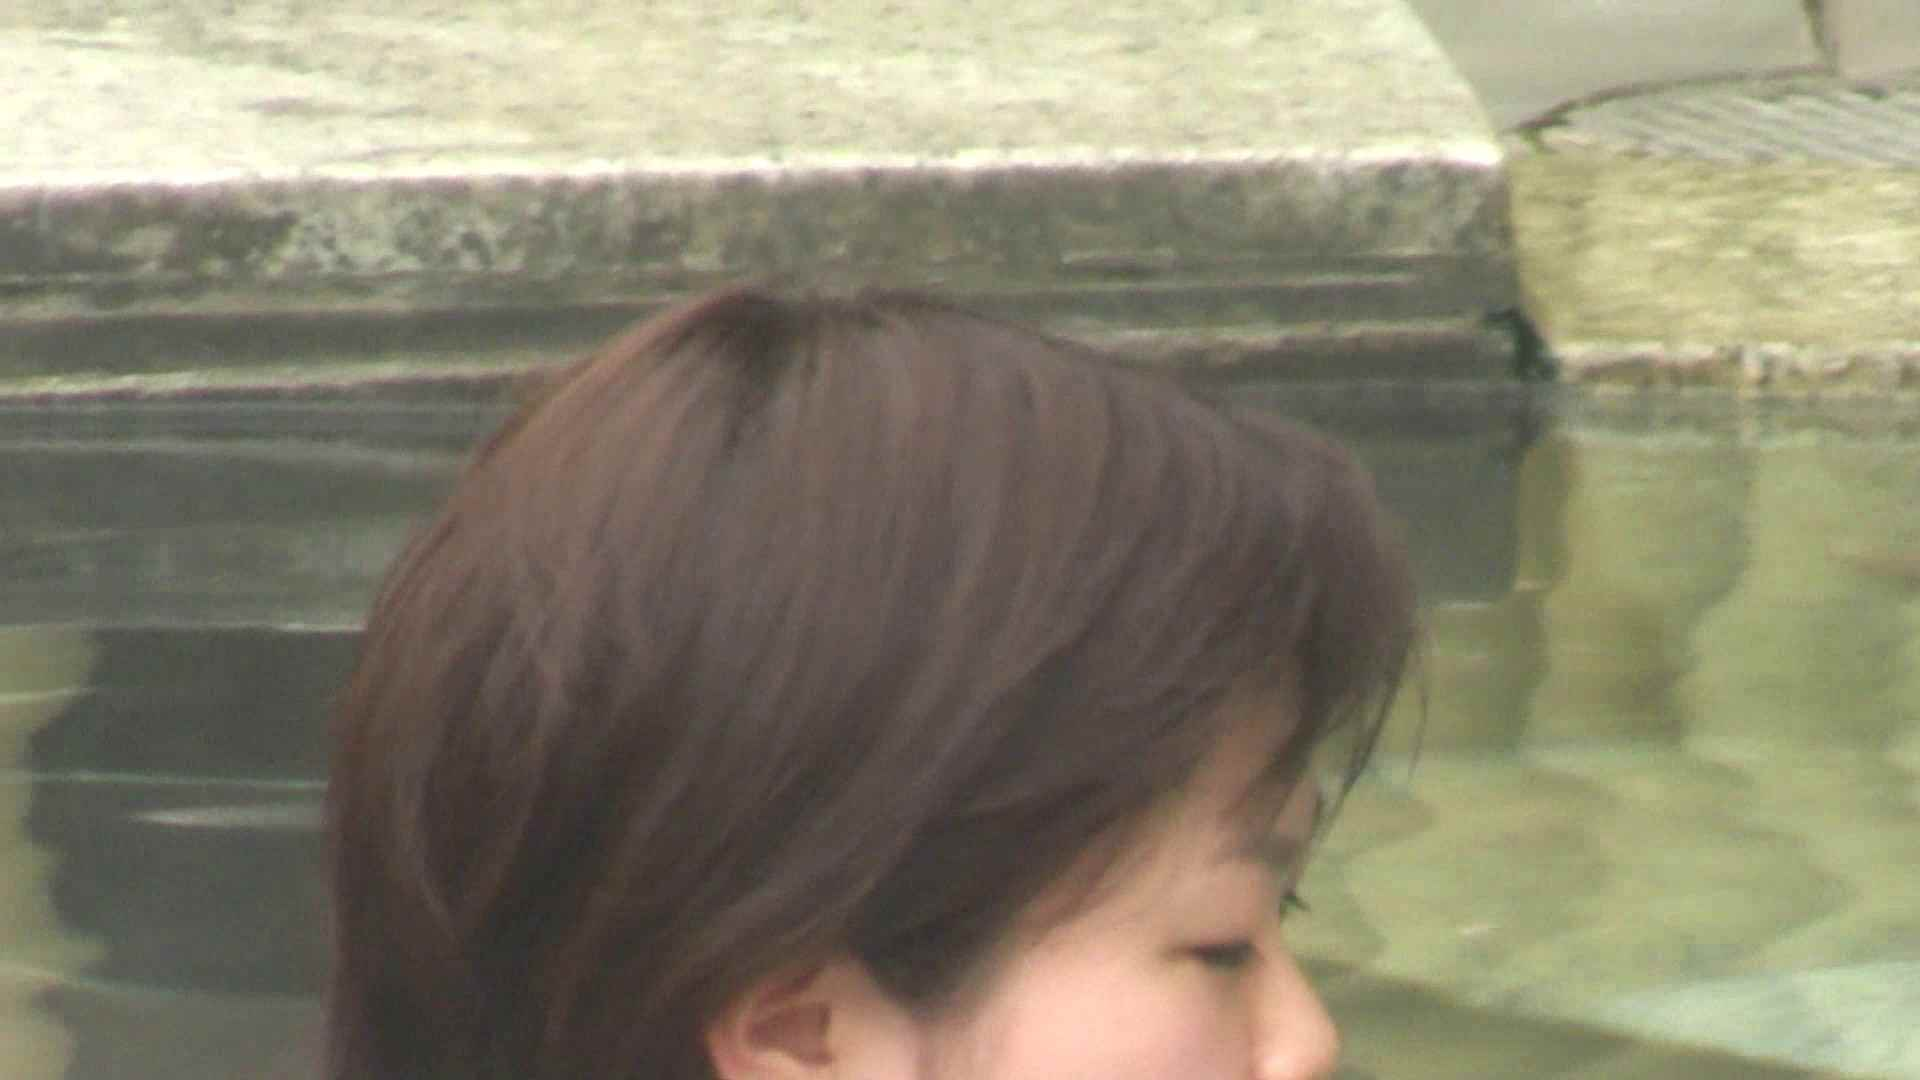 Aquaな露天風呂Vol.675 露天 オマンコ動画キャプチャ 77画像 32